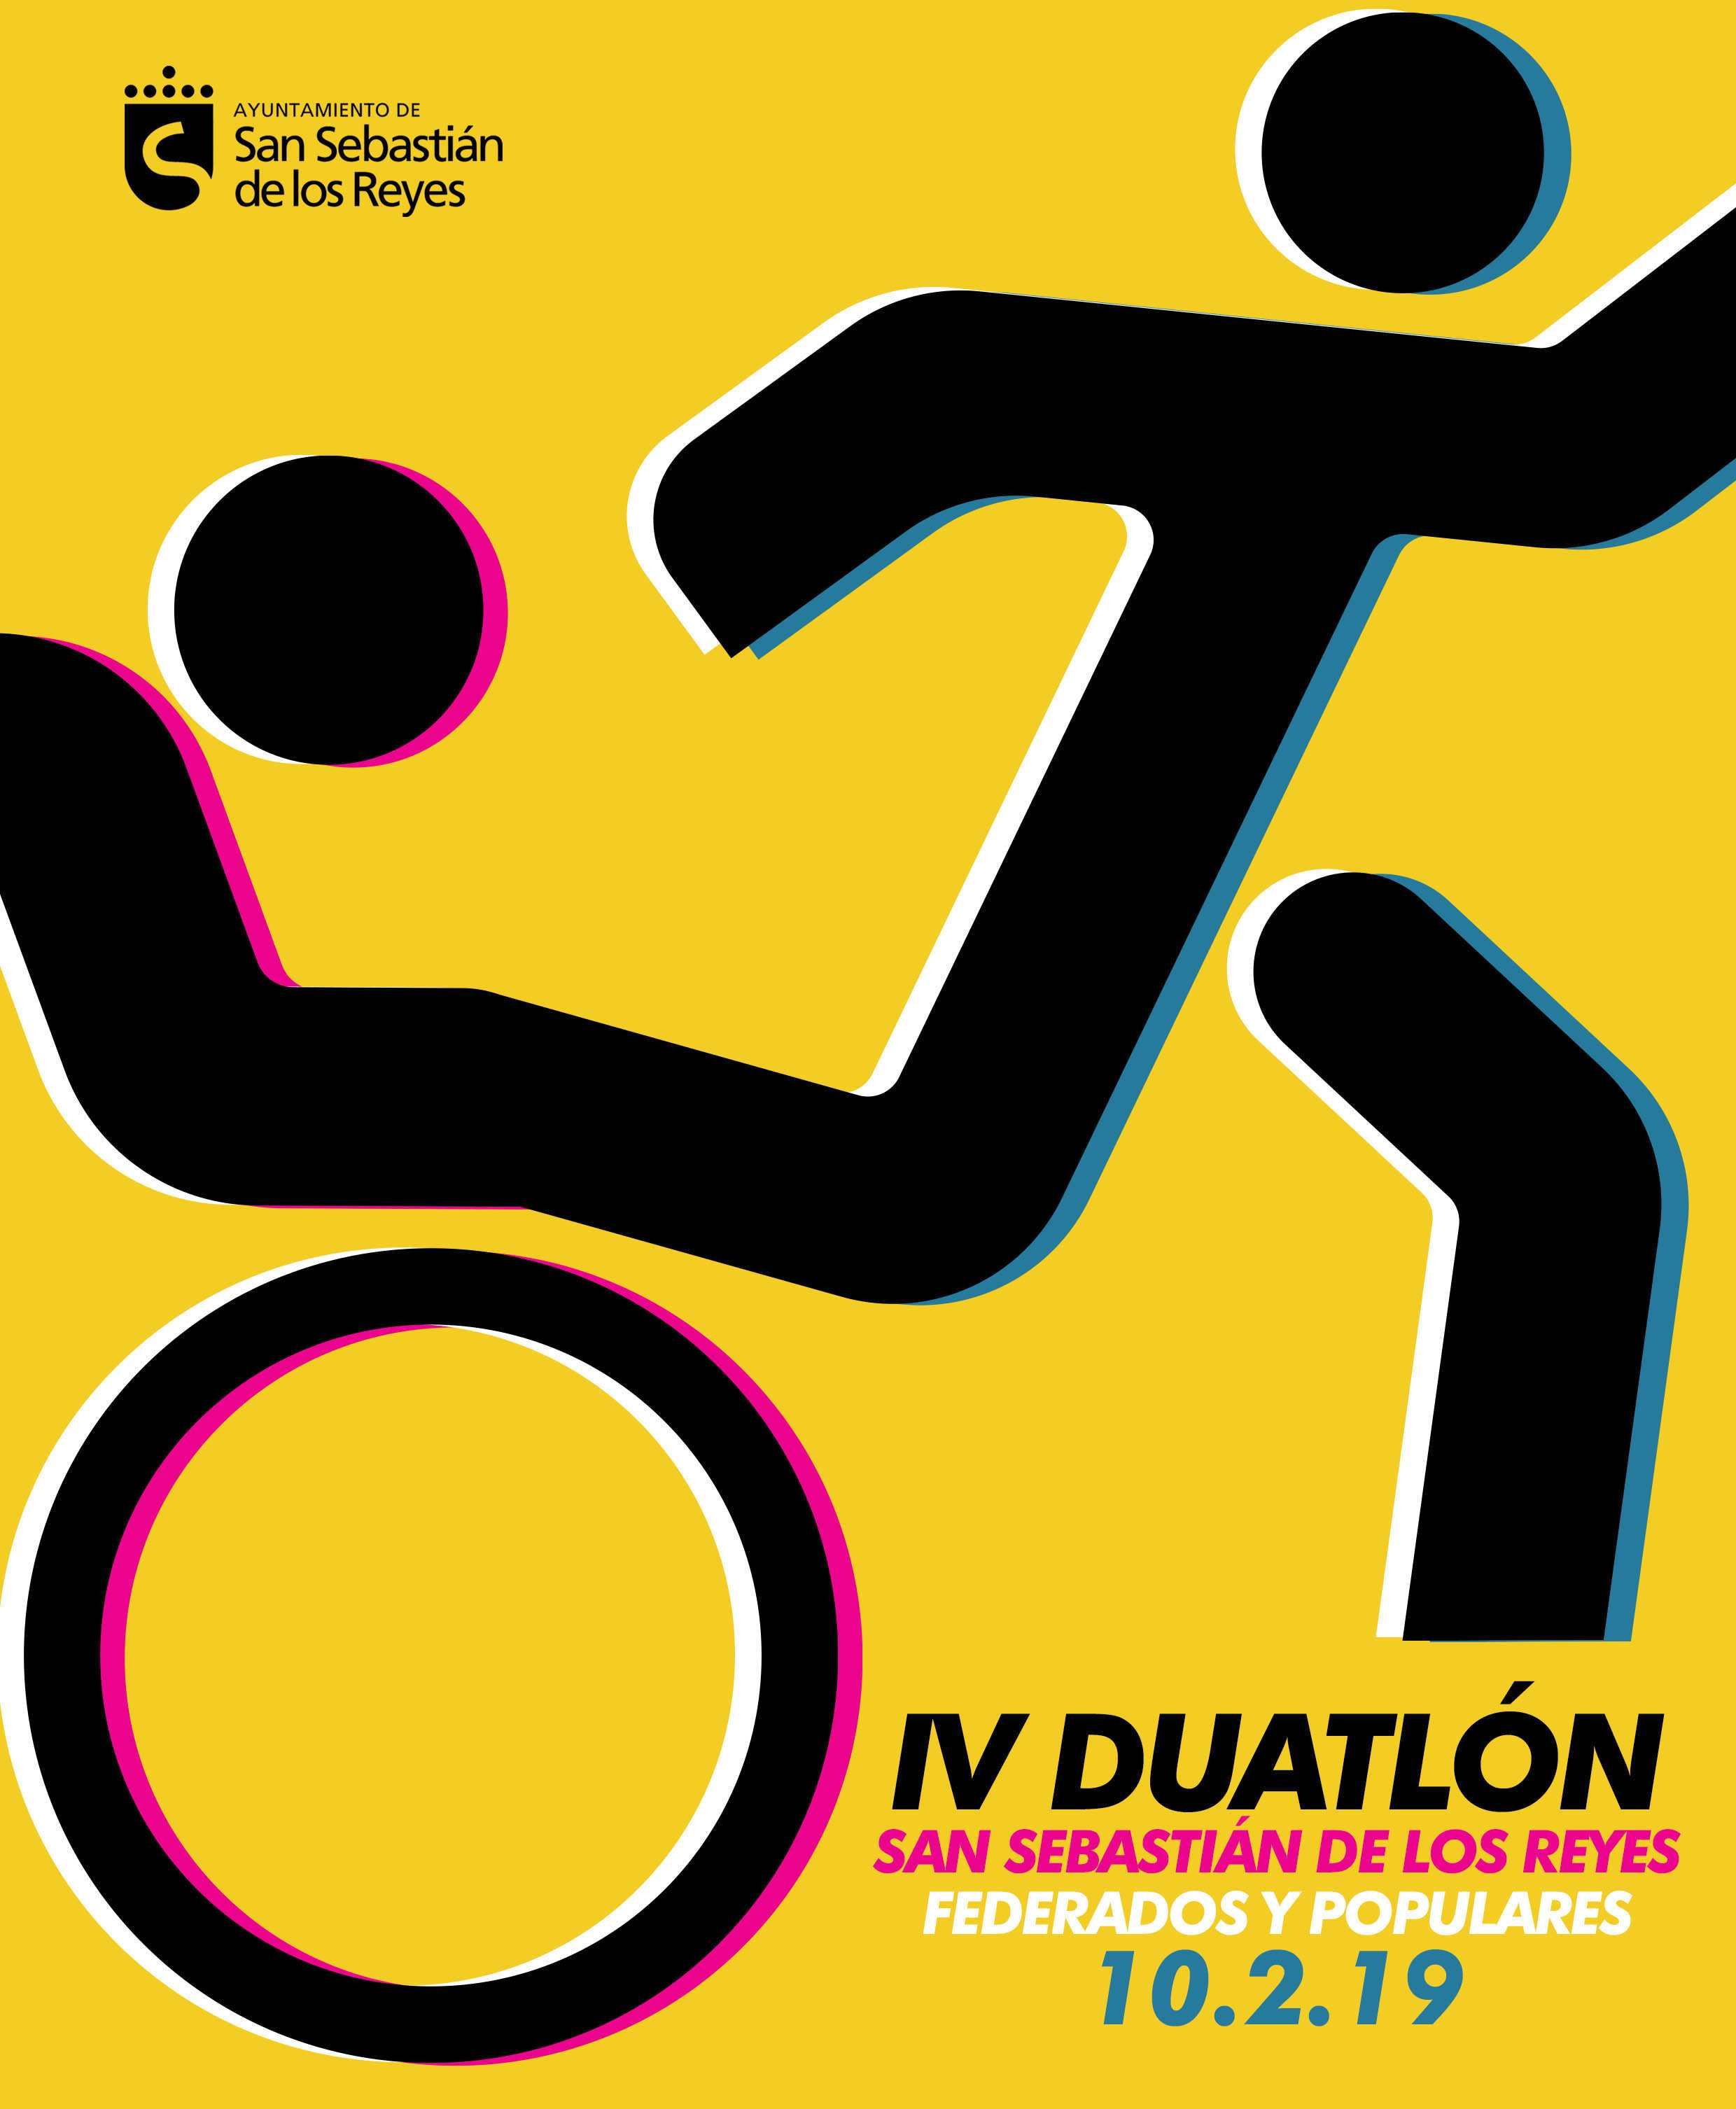 IV DUATLON SAN SEBASTIAN DE LOS REYES - Inscríbete